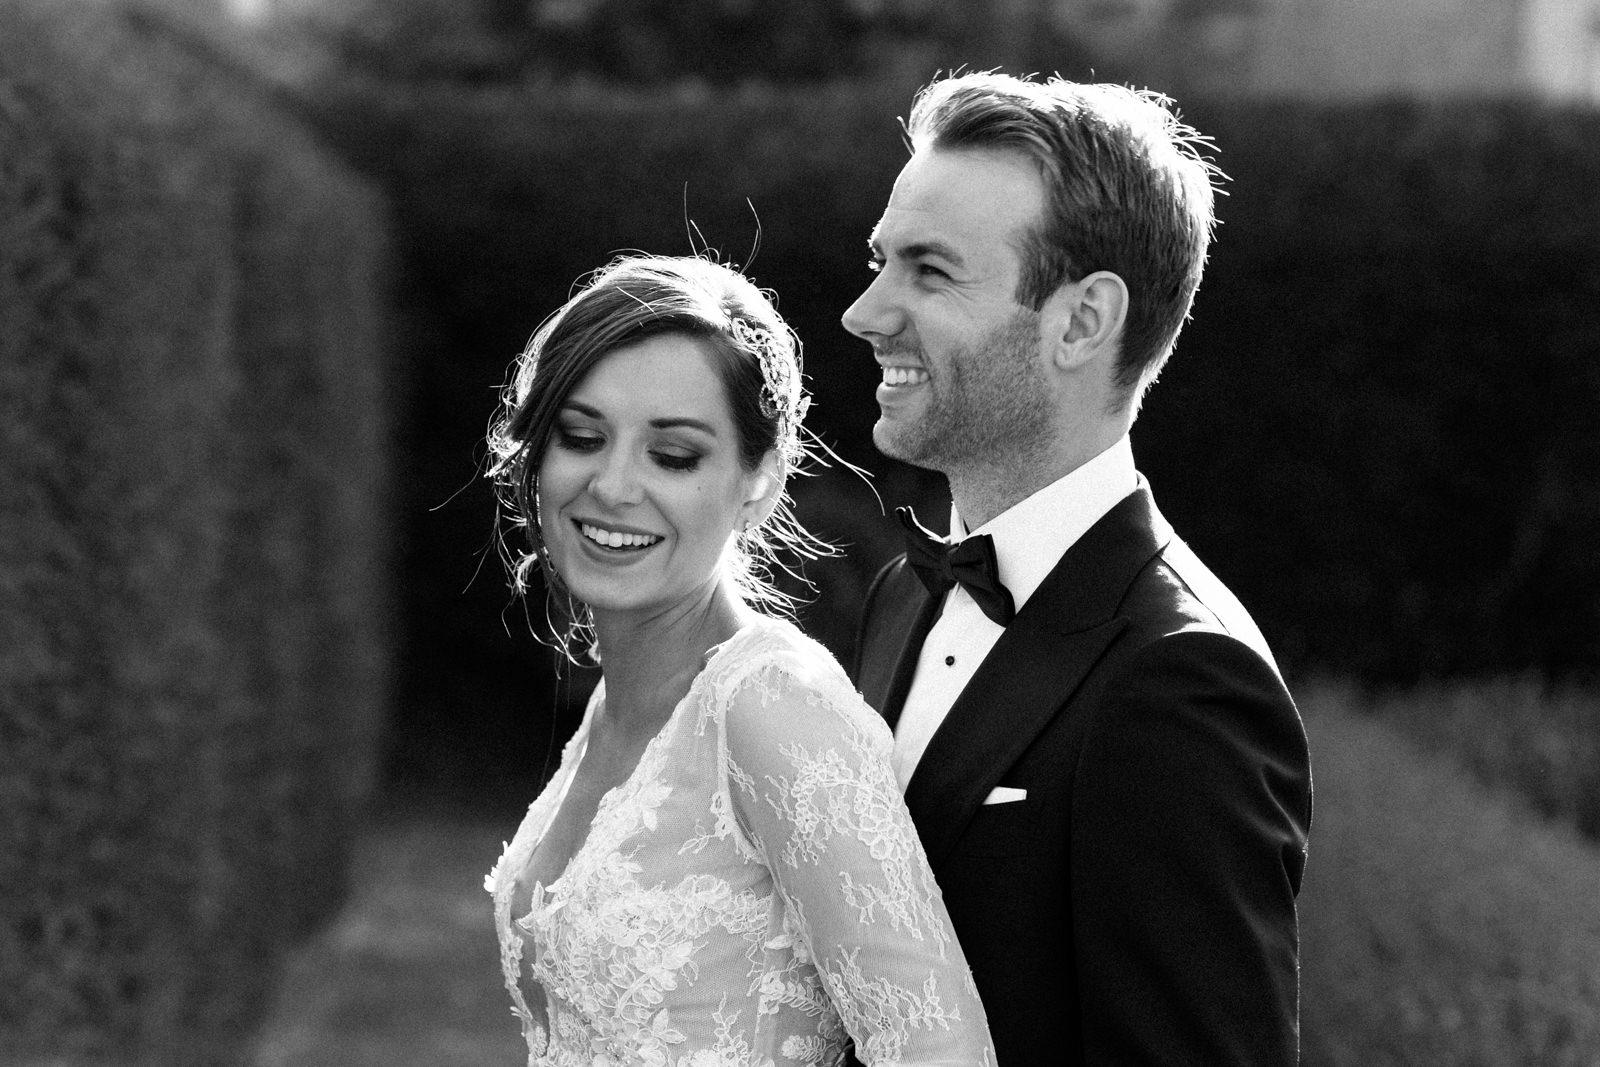 Stanbrooke Abbey Wedding Photographer-310061.jpg